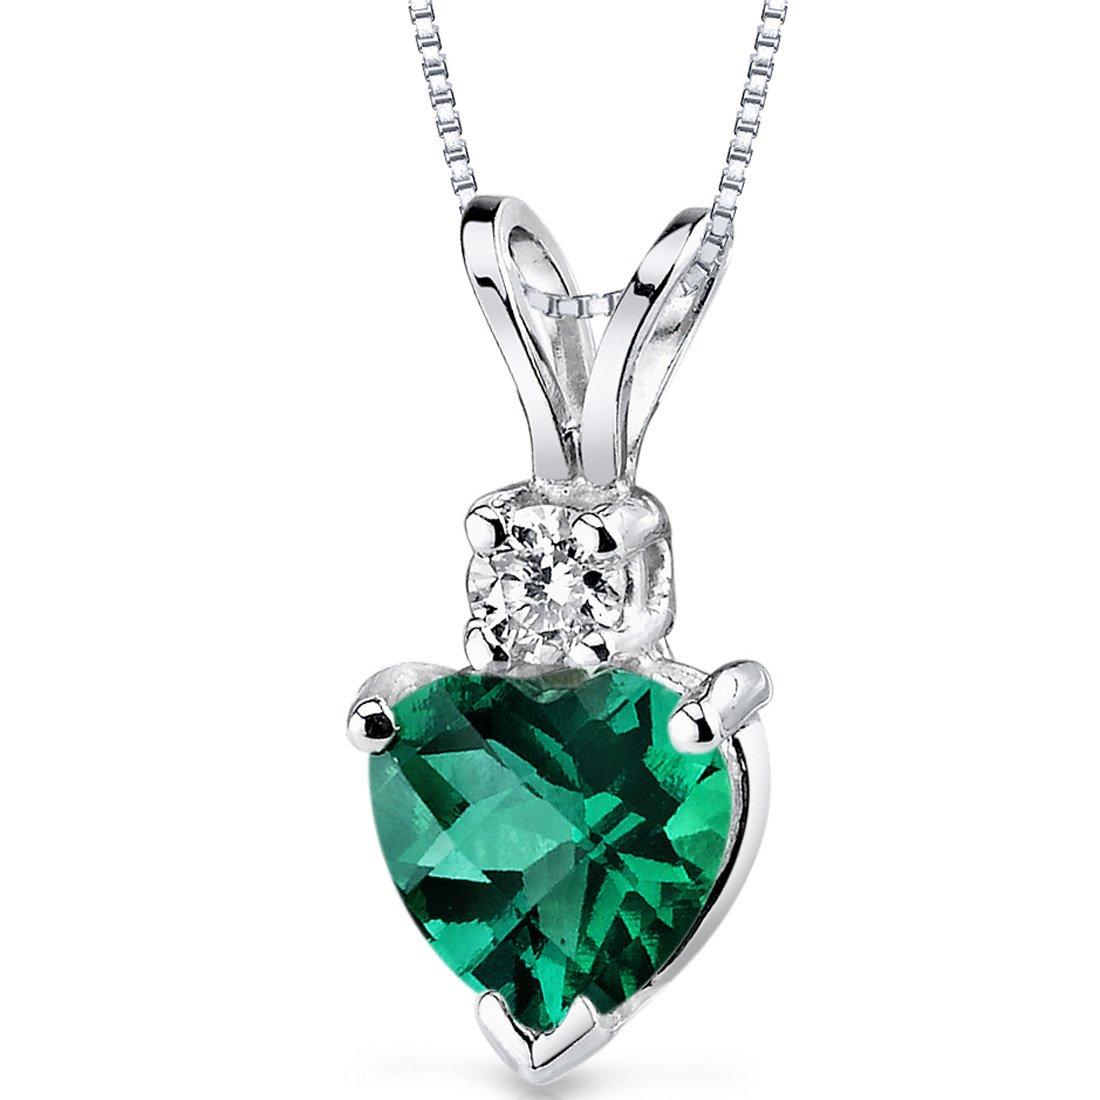 14 Karat White Gold Heart Shape 0.75 Carats Created Emerald Diamond Pendant